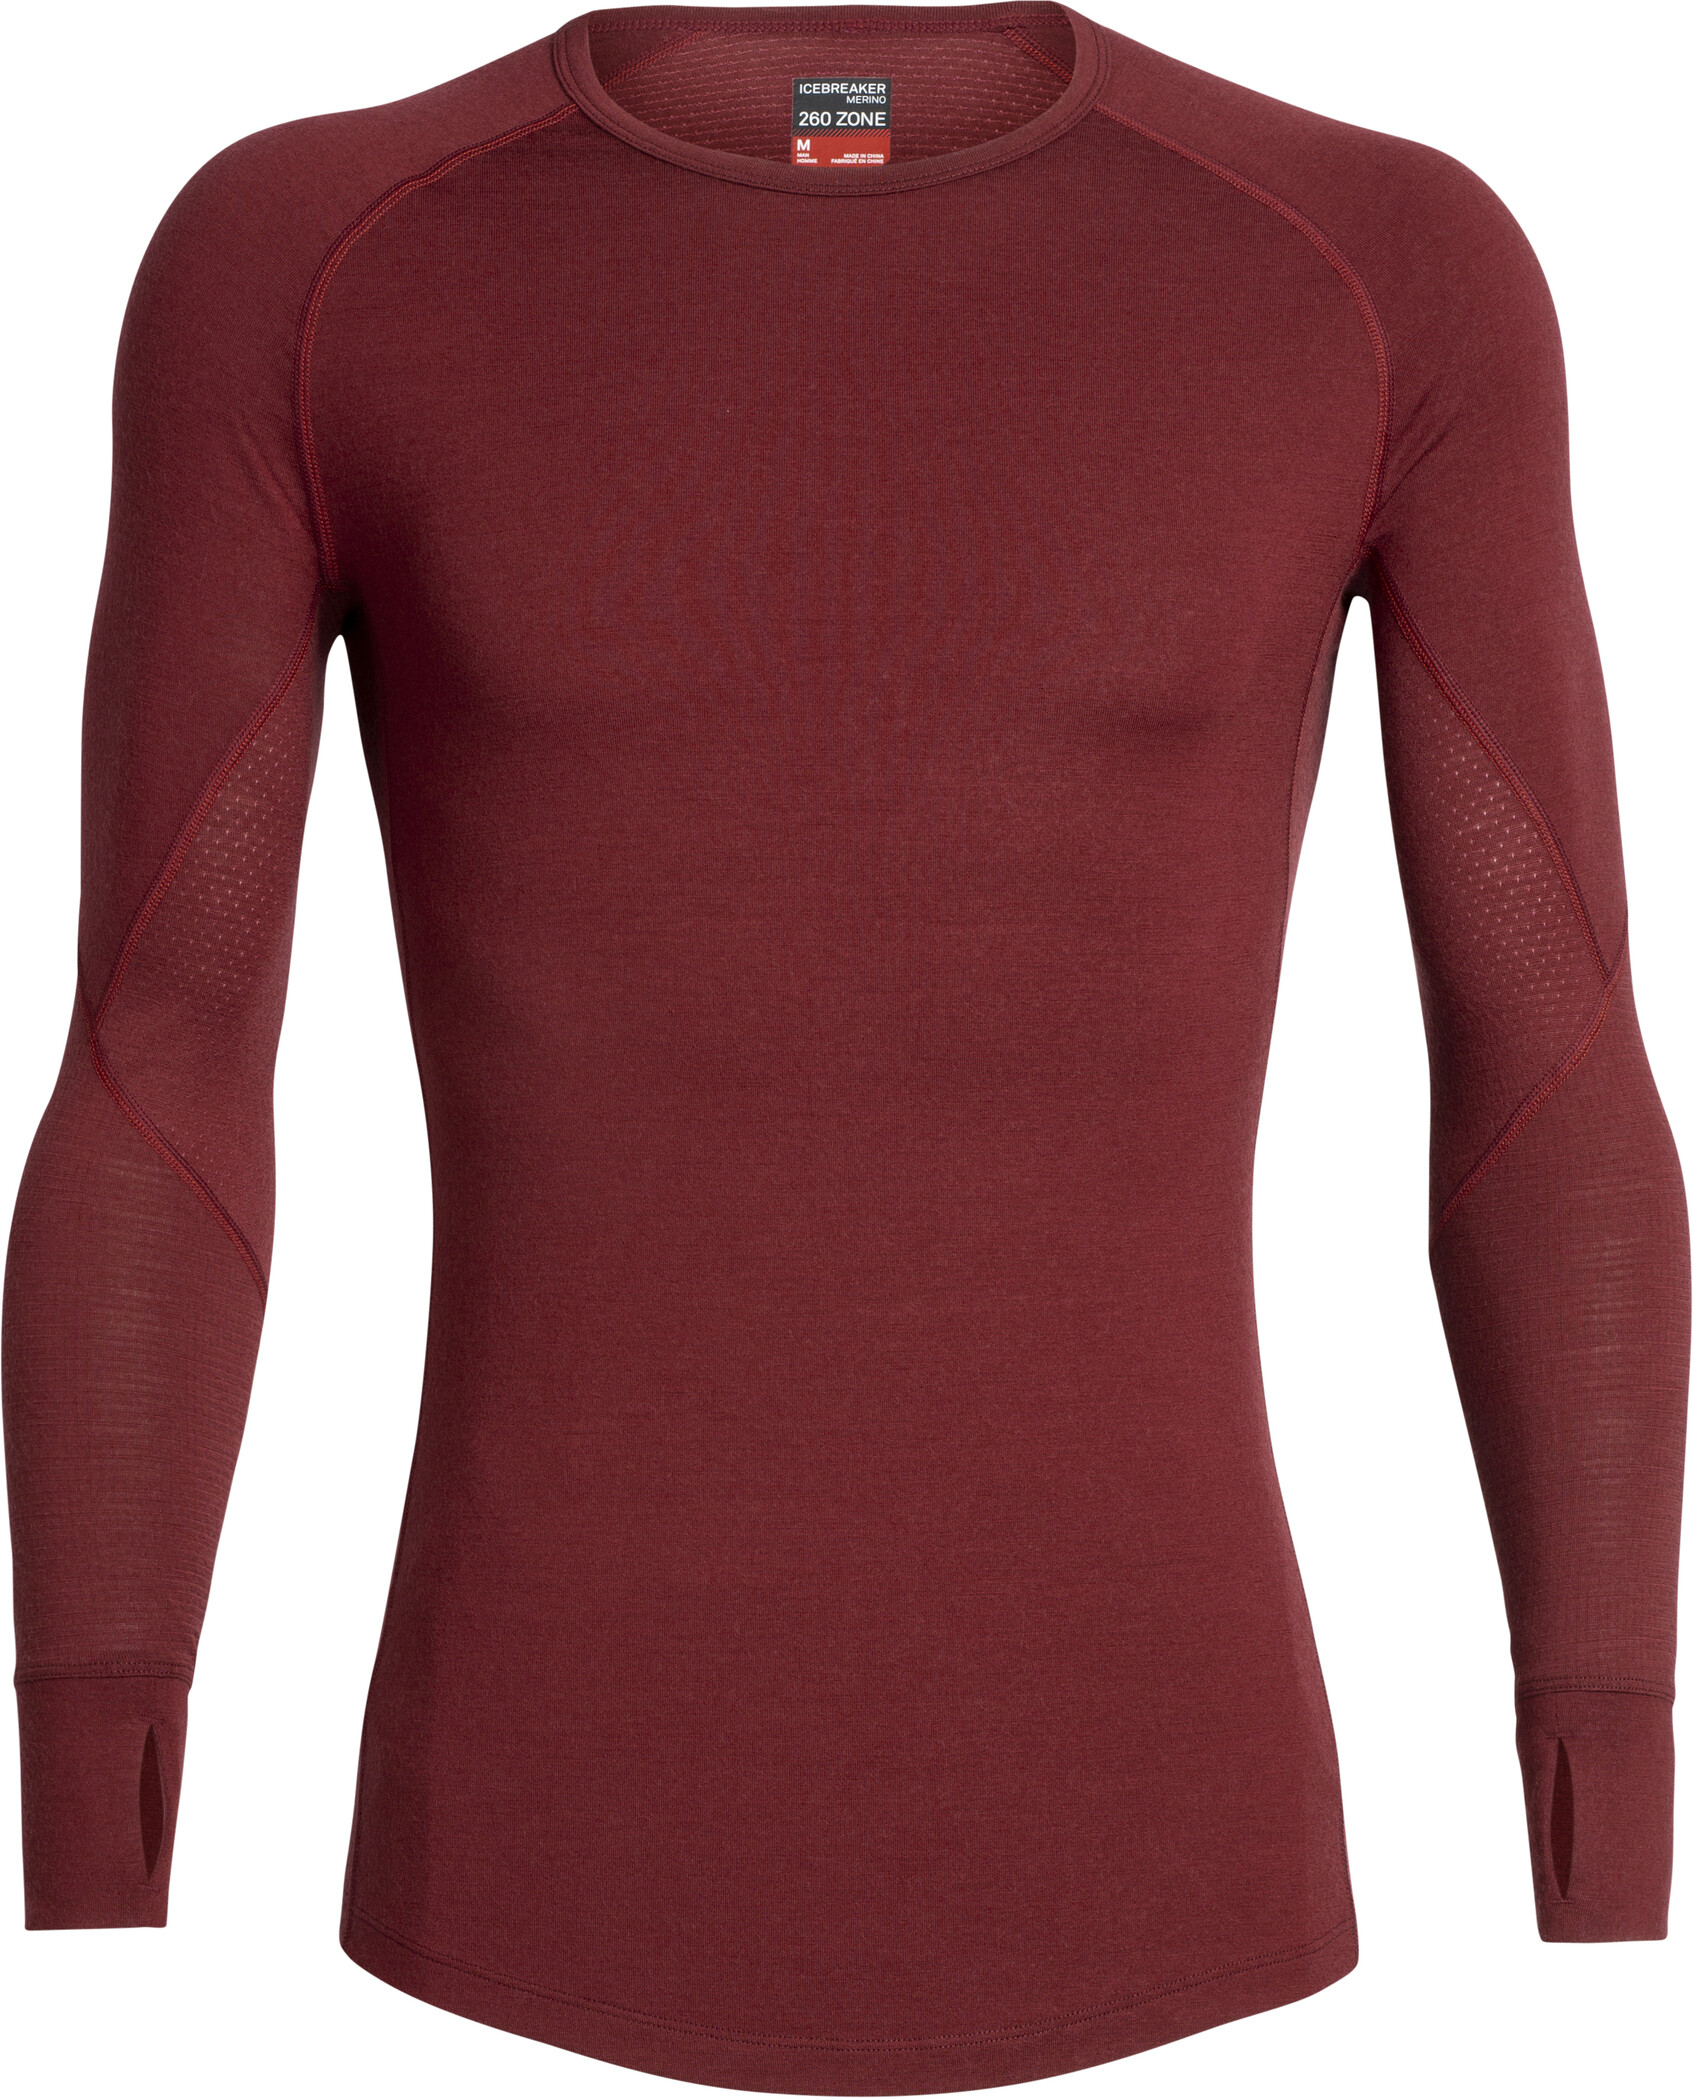 Icebreaker 260 Zone Langærmet T-shirt Herrer, cabernet/chili red (2019) | Base layers